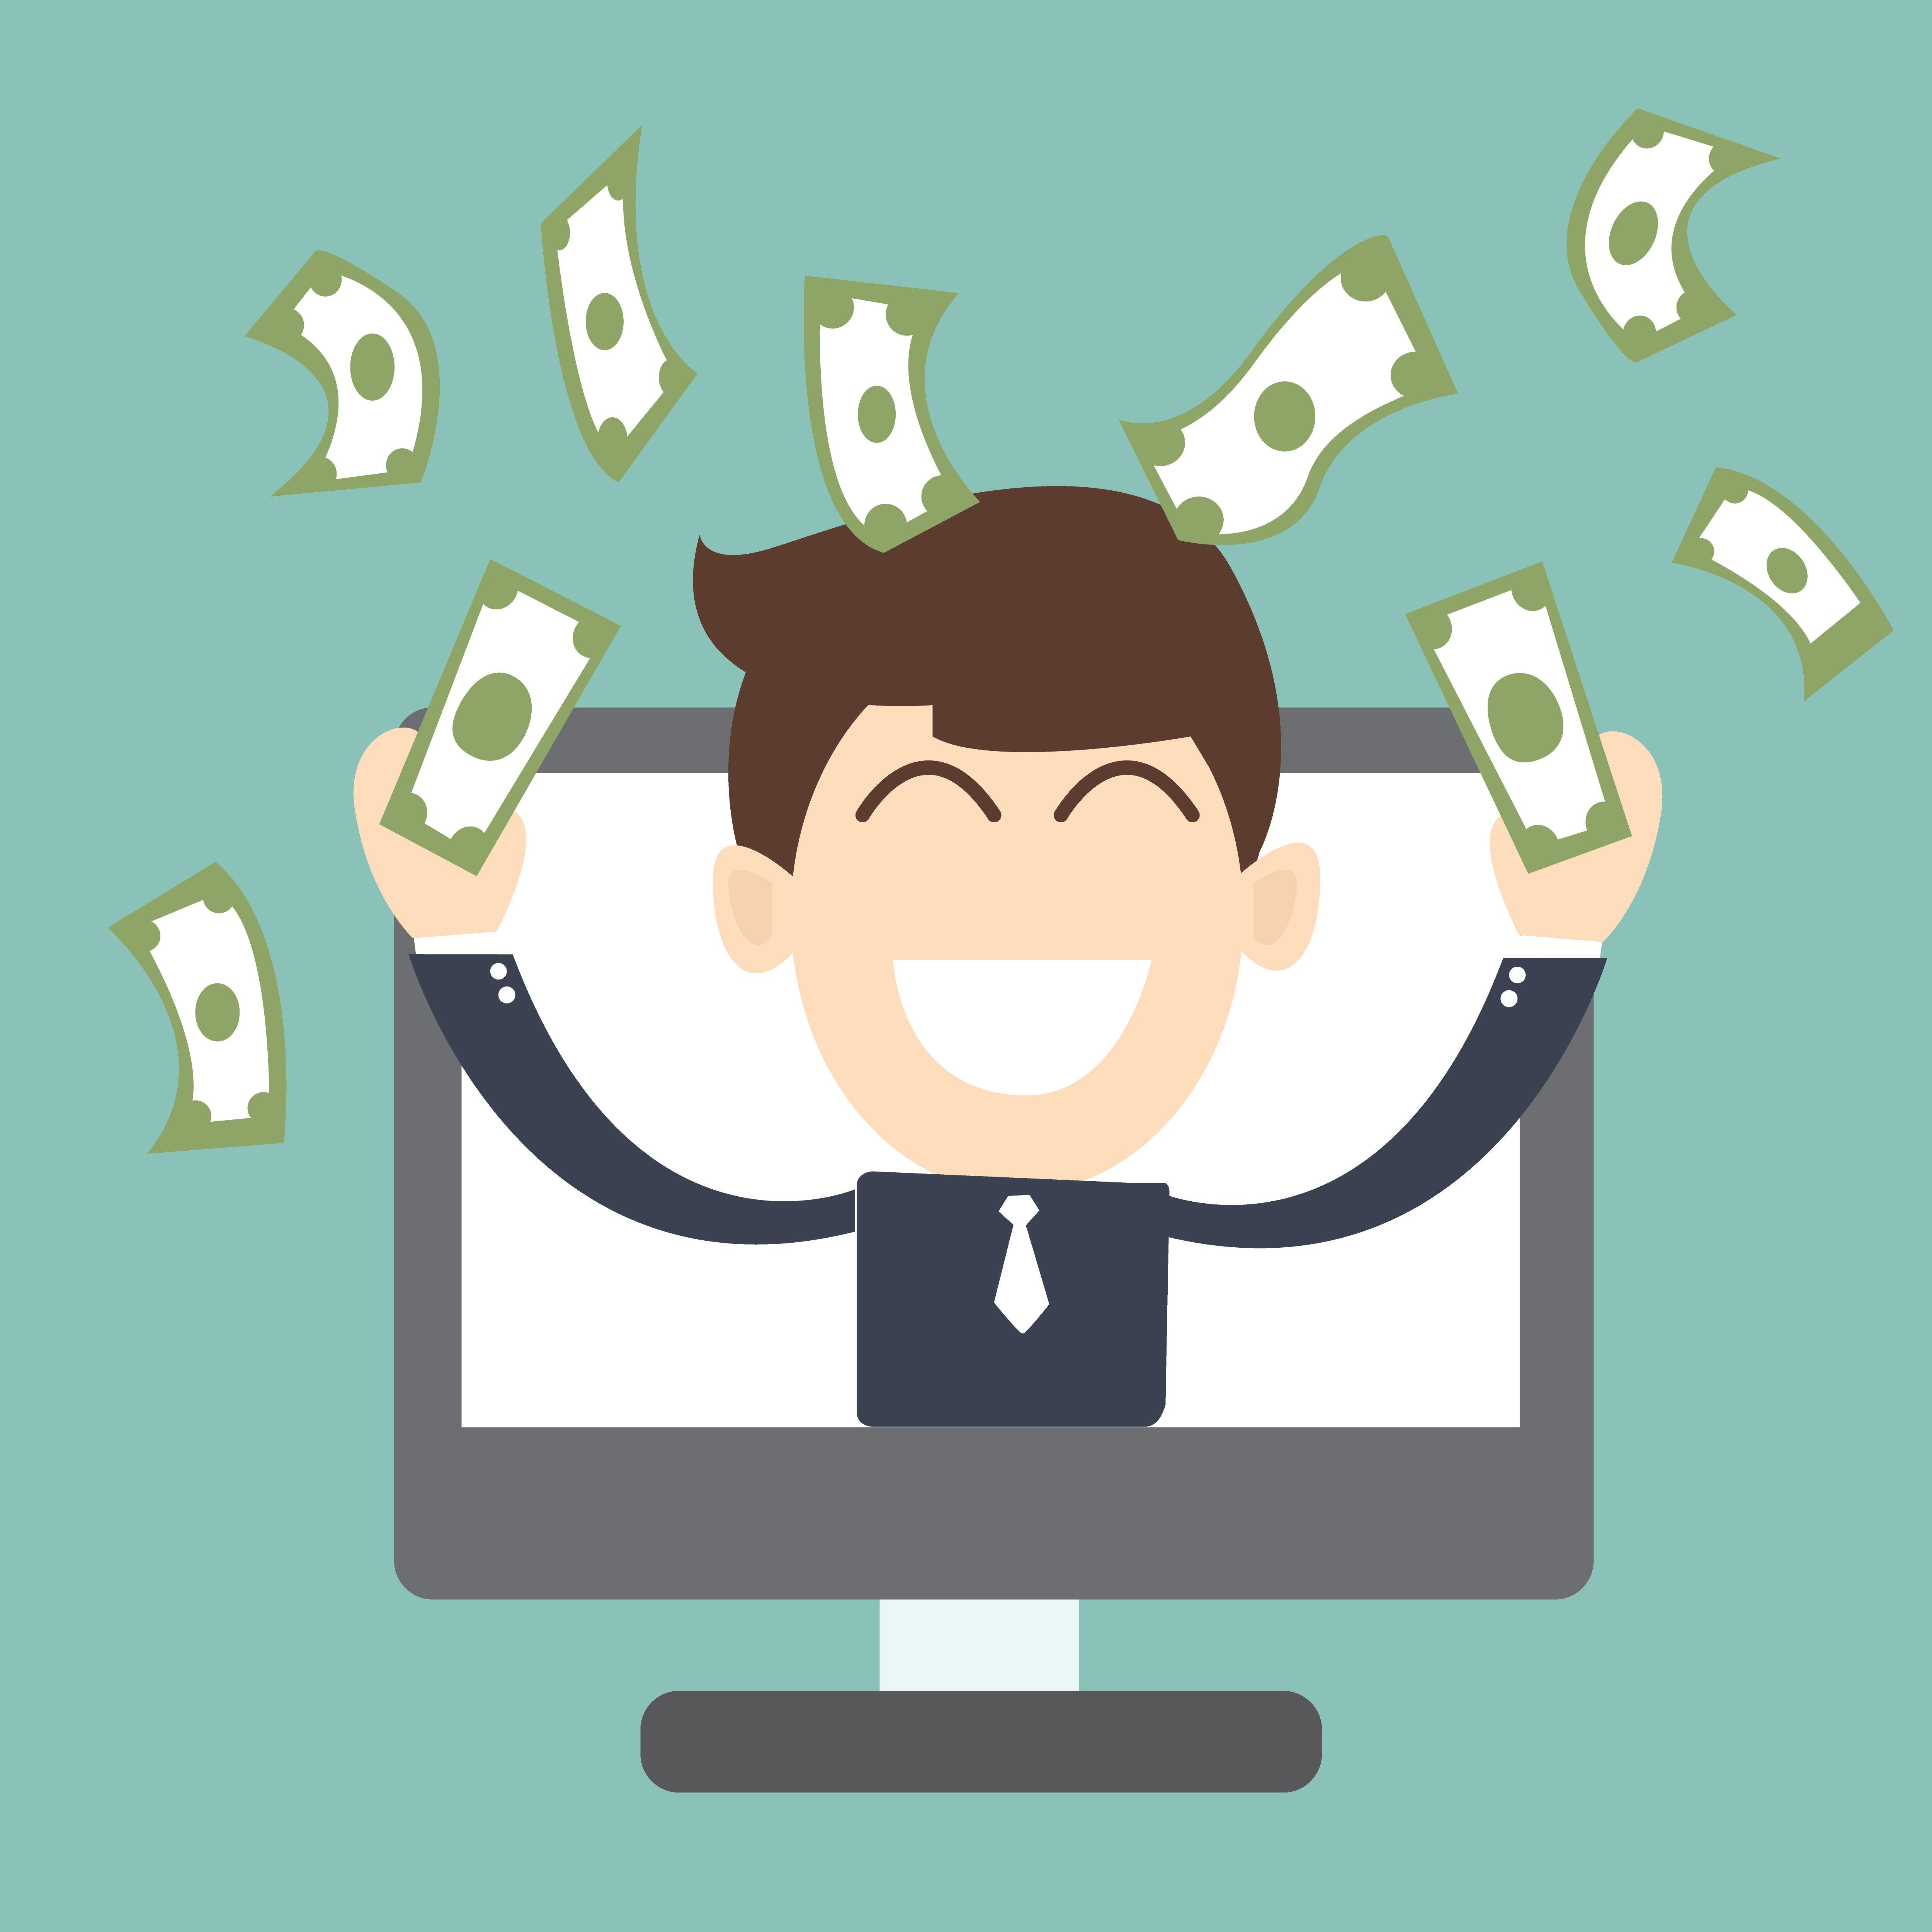 Successful entrepreneur clipart image free library 7 Keys To Entrepreneur Success image free library